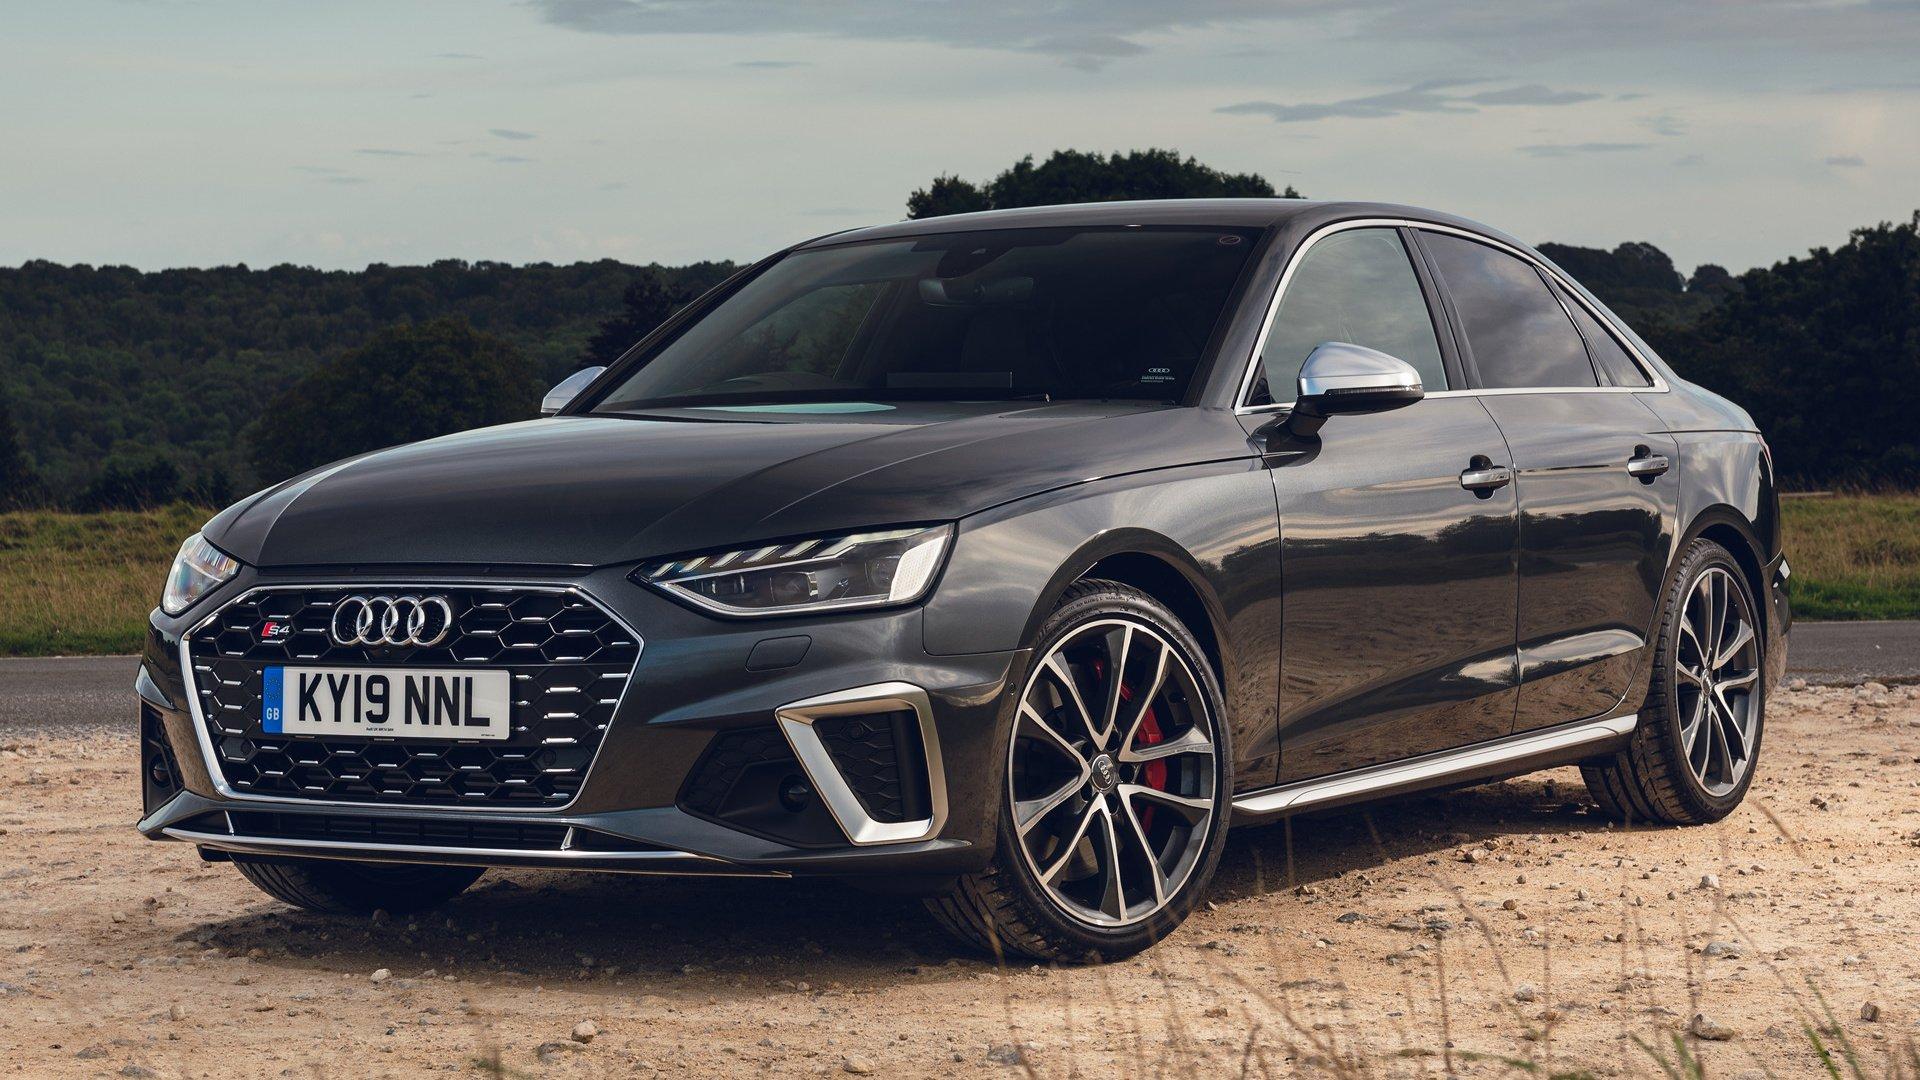 2019 Audi S4 Hd Wallpaper Background